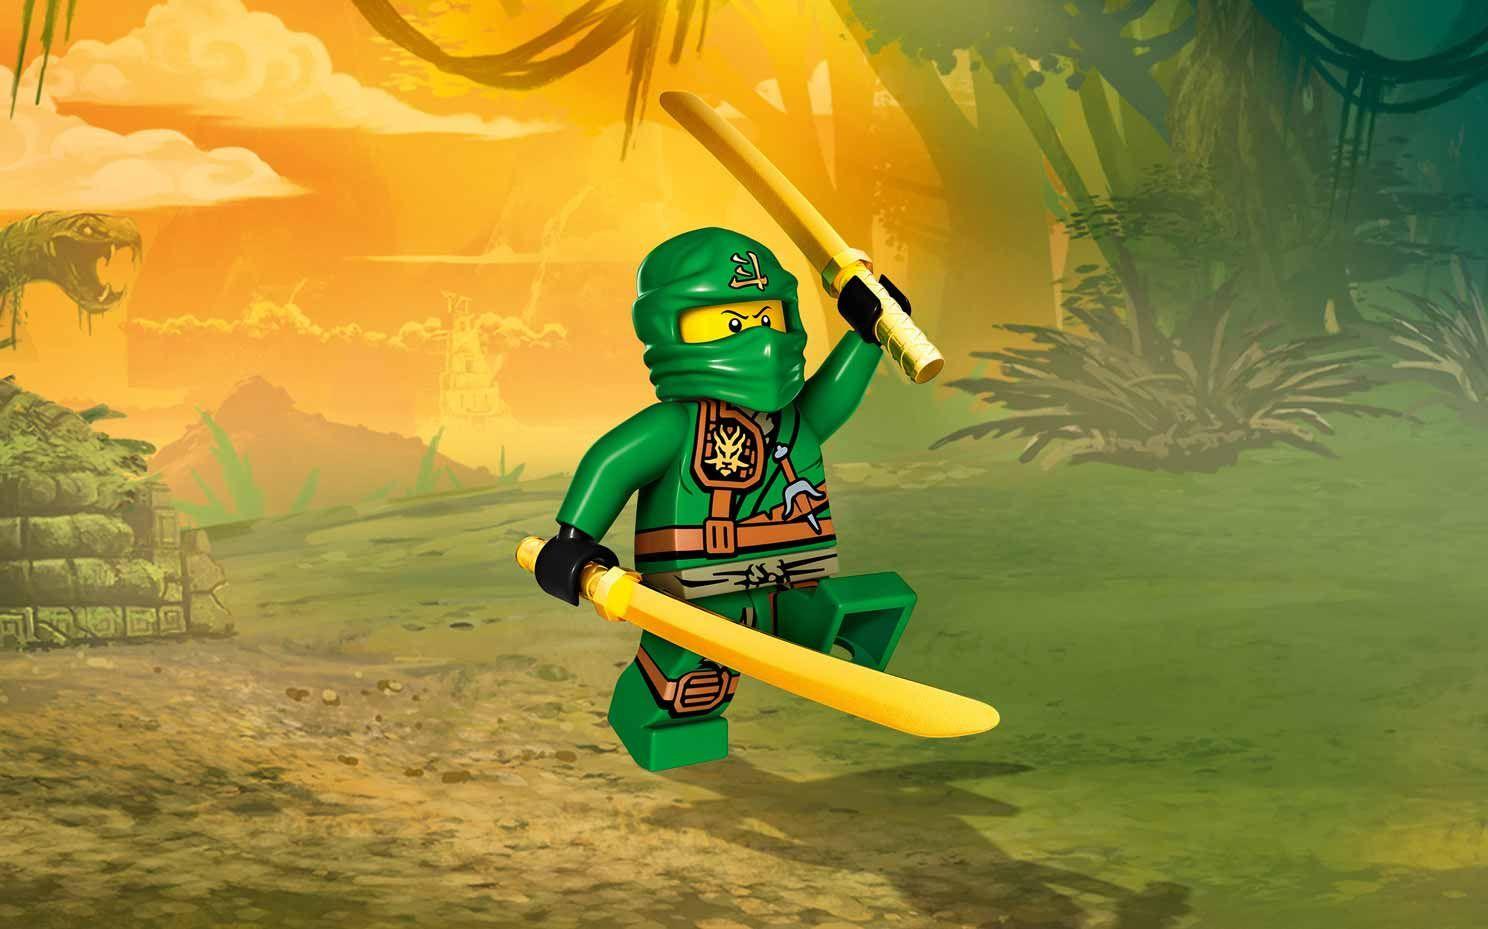 Lloyd personajes ninjago lego pinterest - Personnage ninjago lego ...